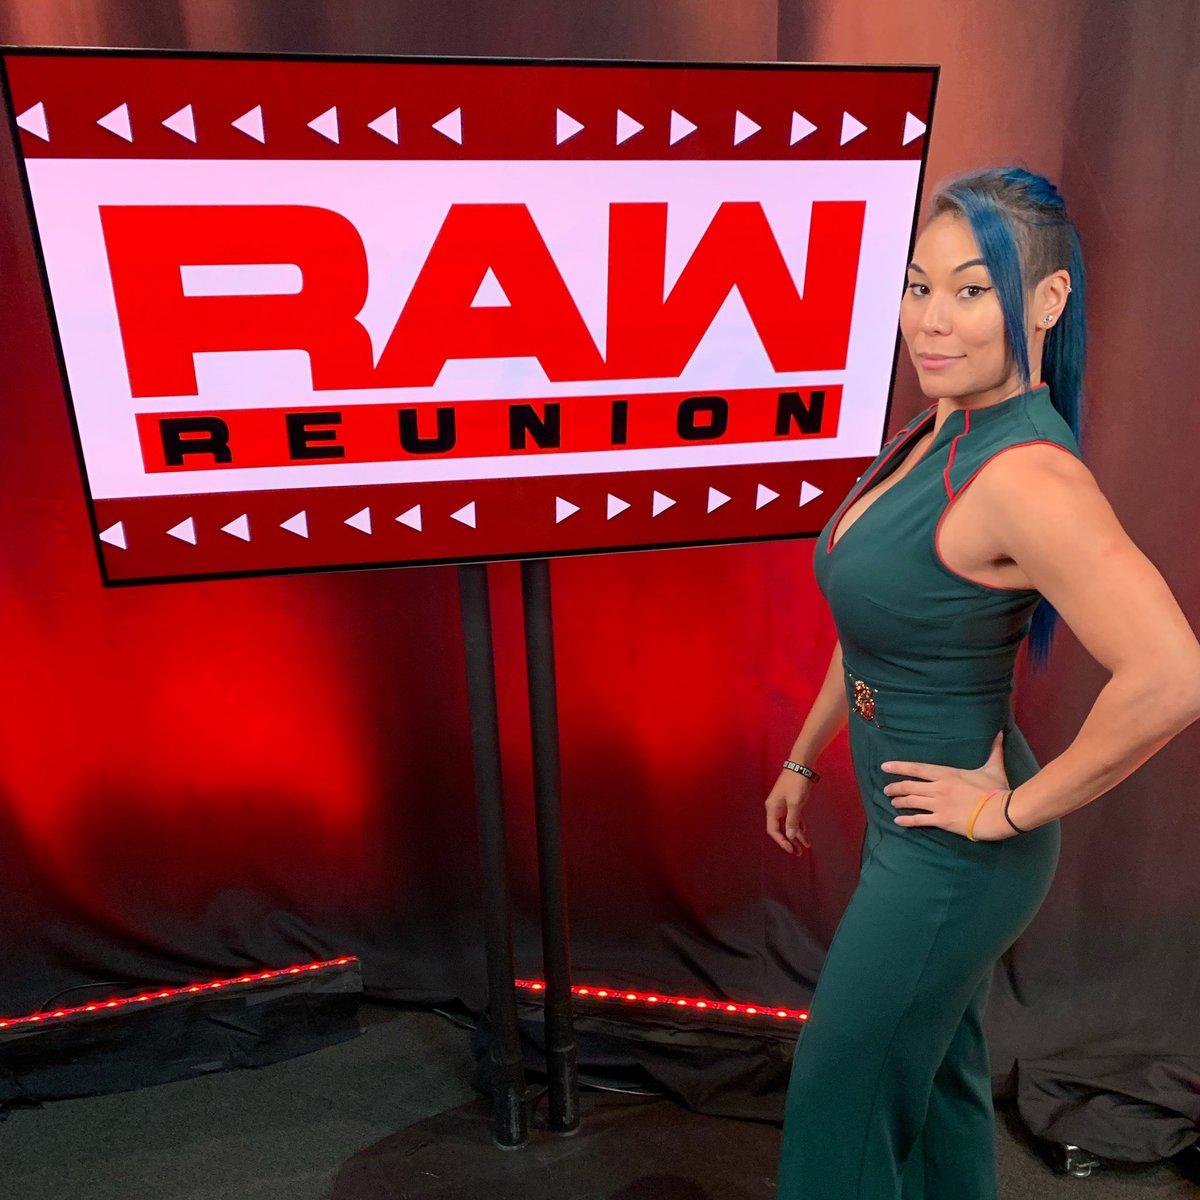 Blessed. #HBIC #WWE #RawReunion #WWENXT